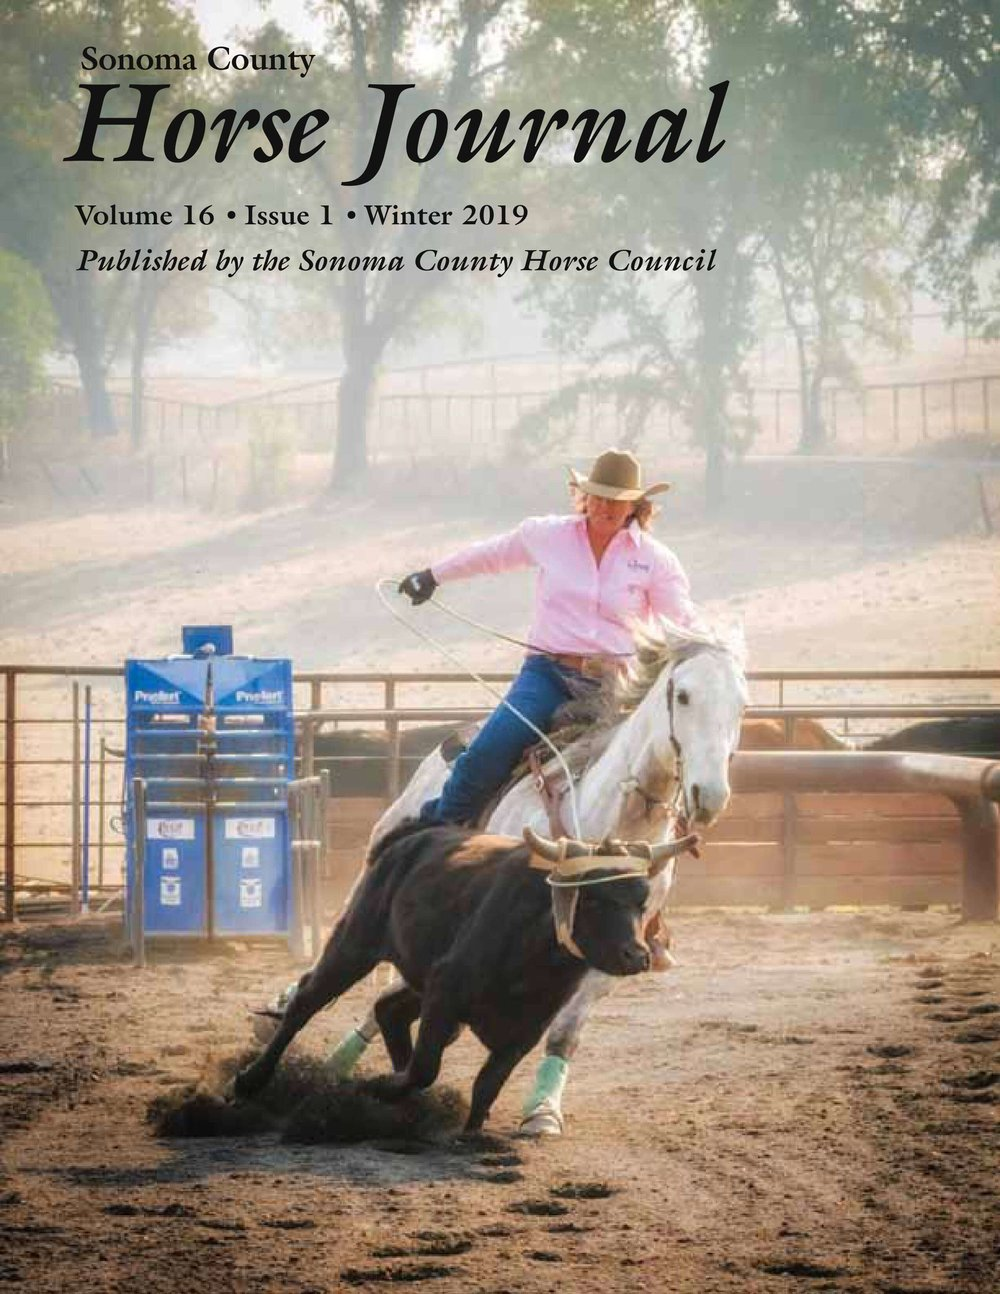 Horse Journal Winter 2019.jpg